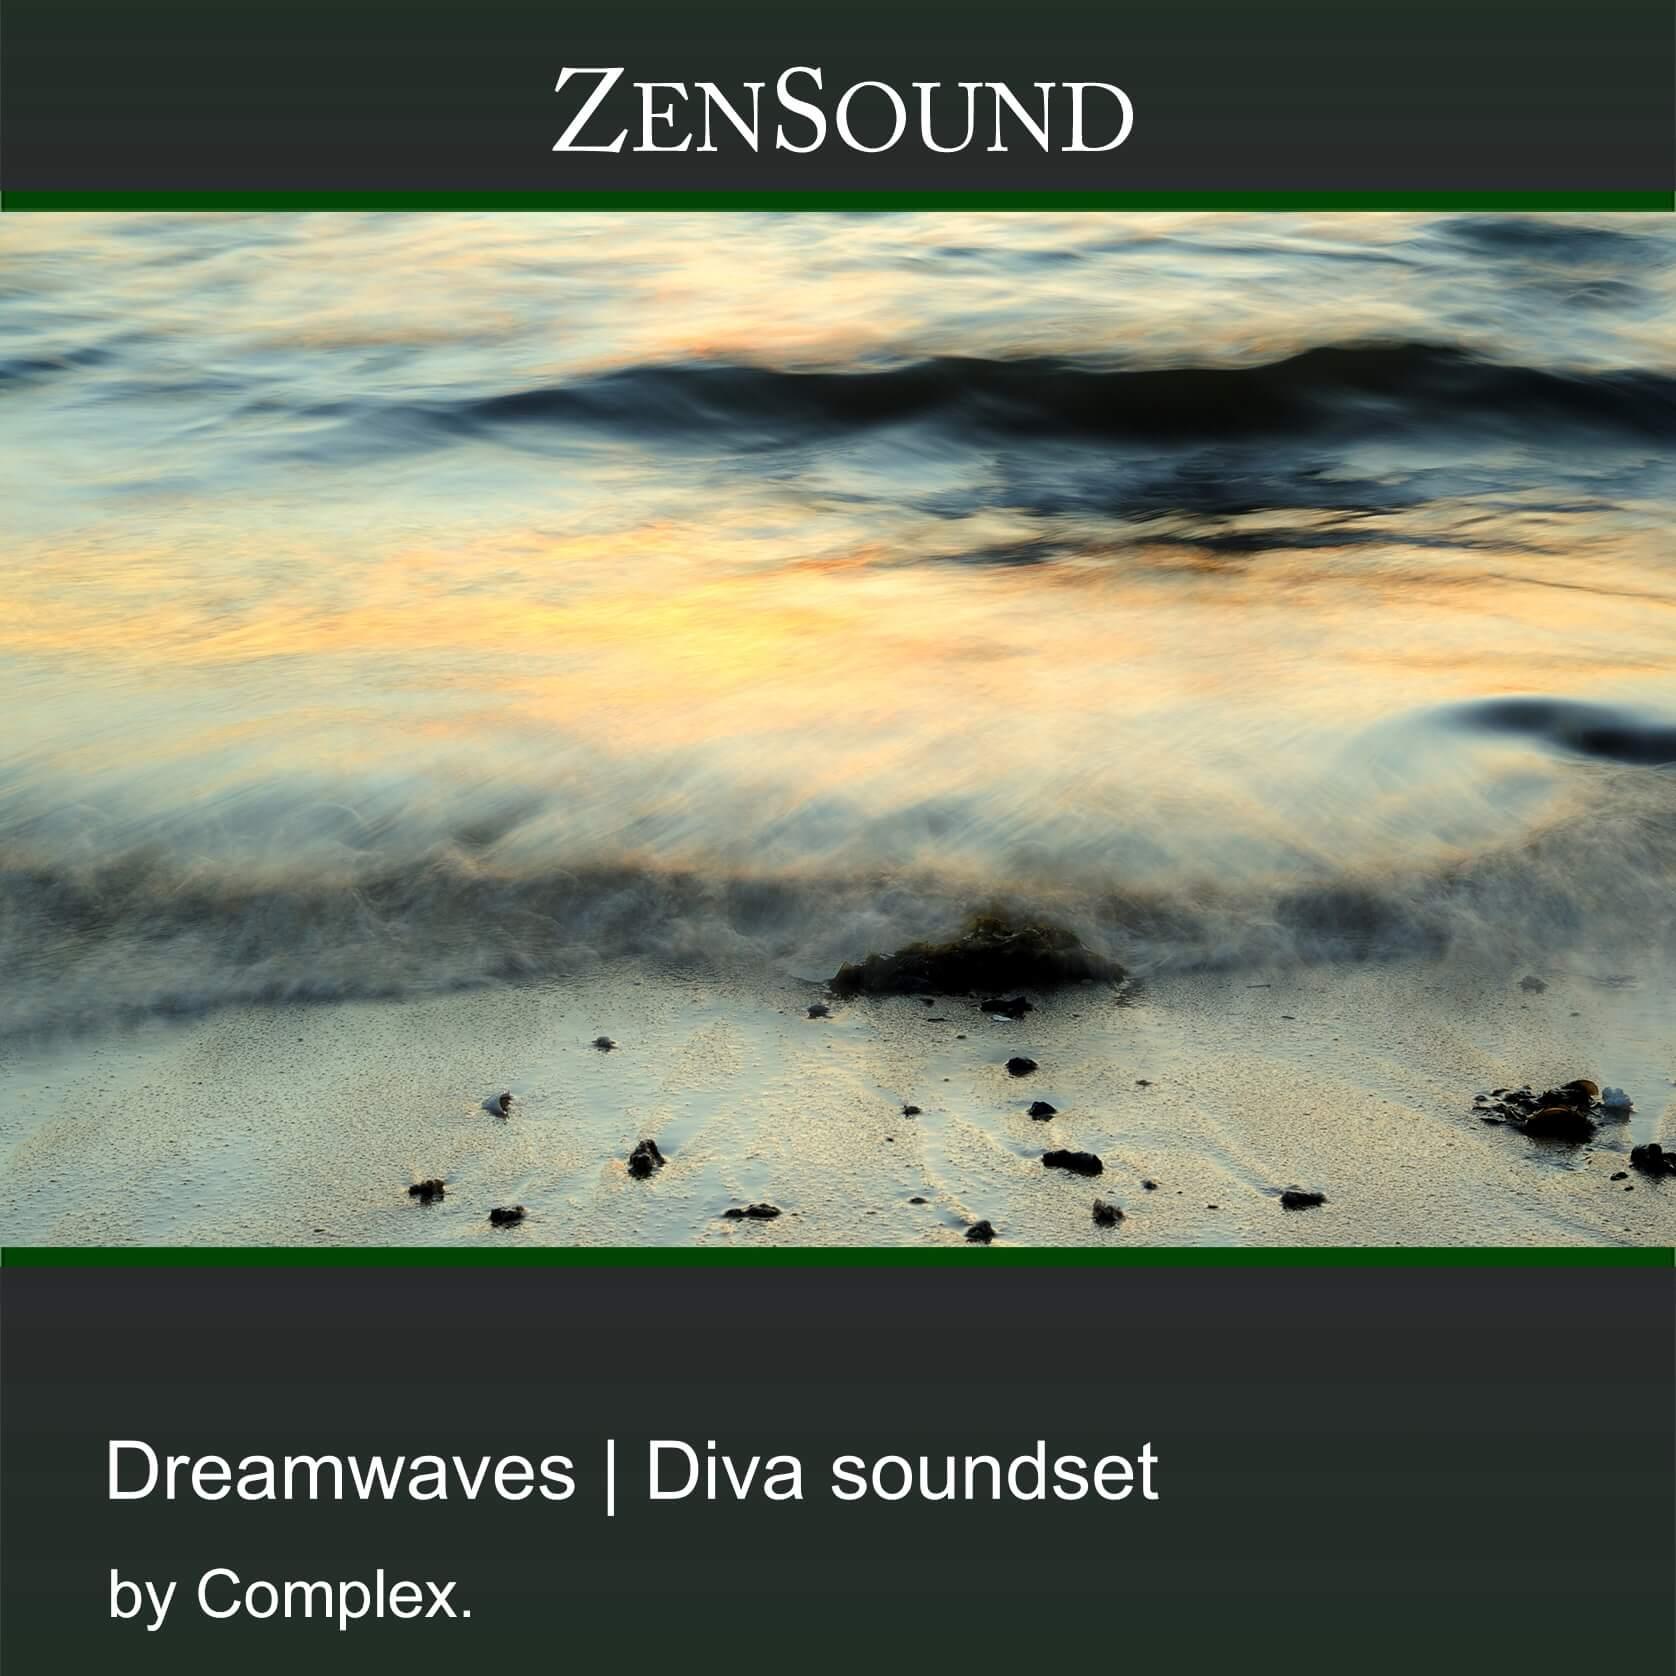 Zensound dreamwaves soundset for u he diva released - U he diva ...